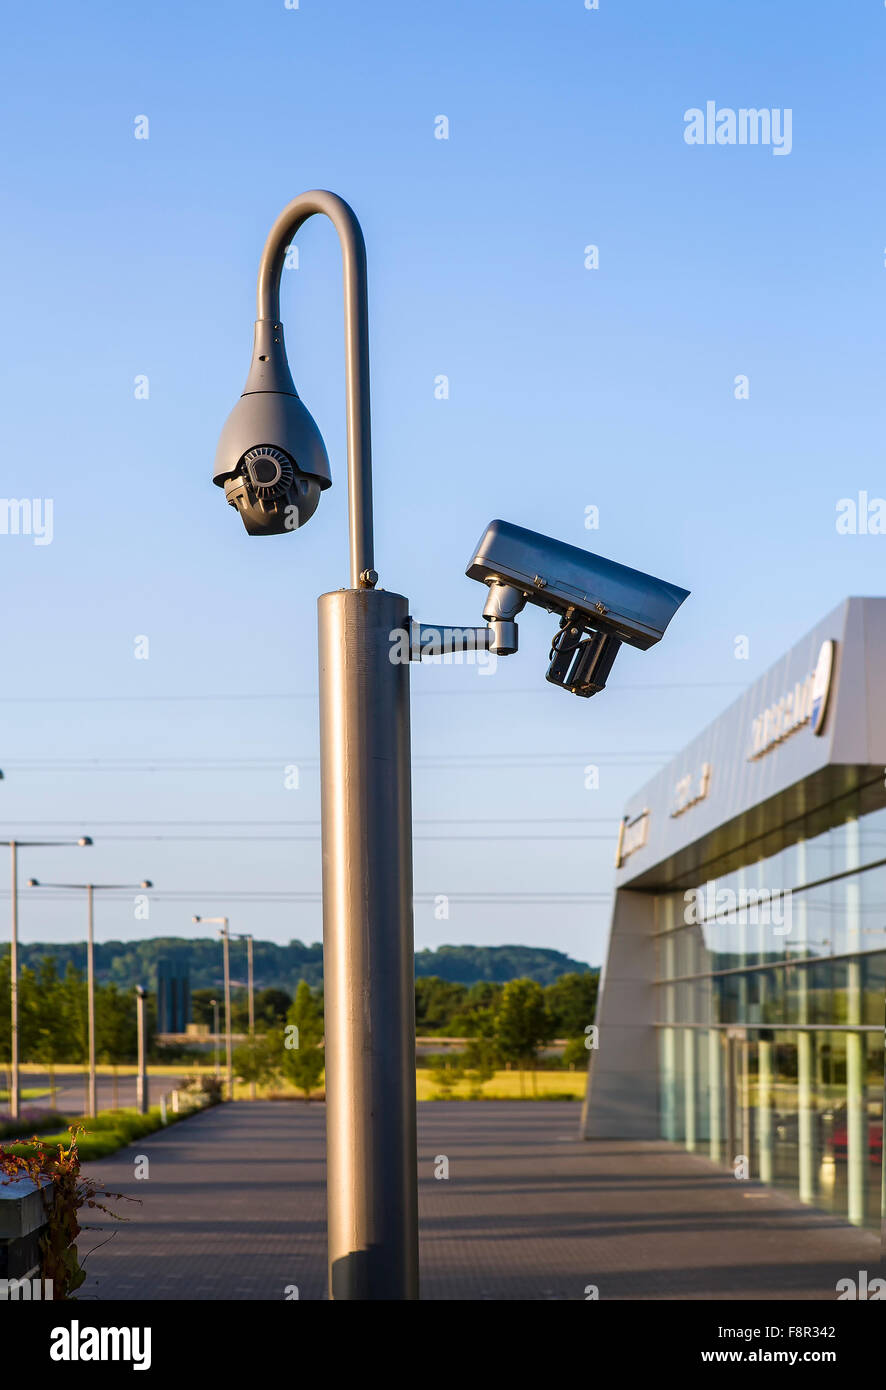 CCTV security camera under blue sky - Stock Image